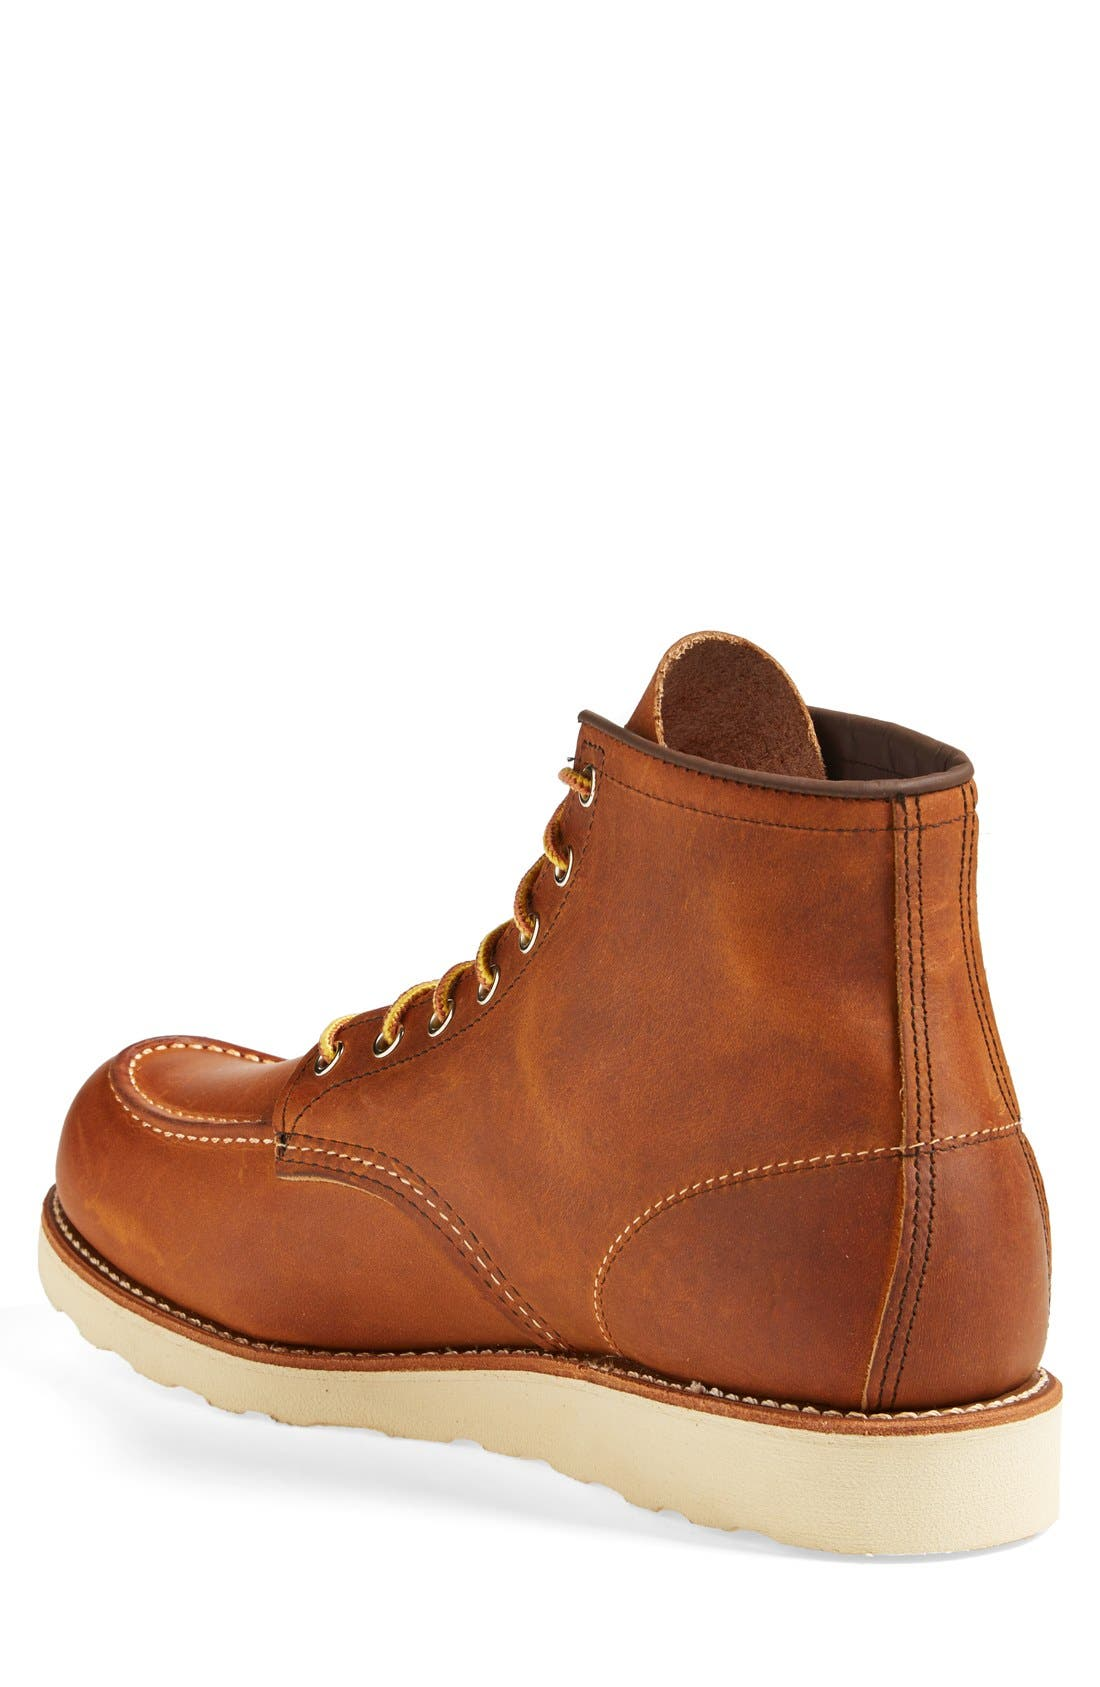 Moc Toe Boot,                             Alternate thumbnail 2, color,                             Copper Yuma